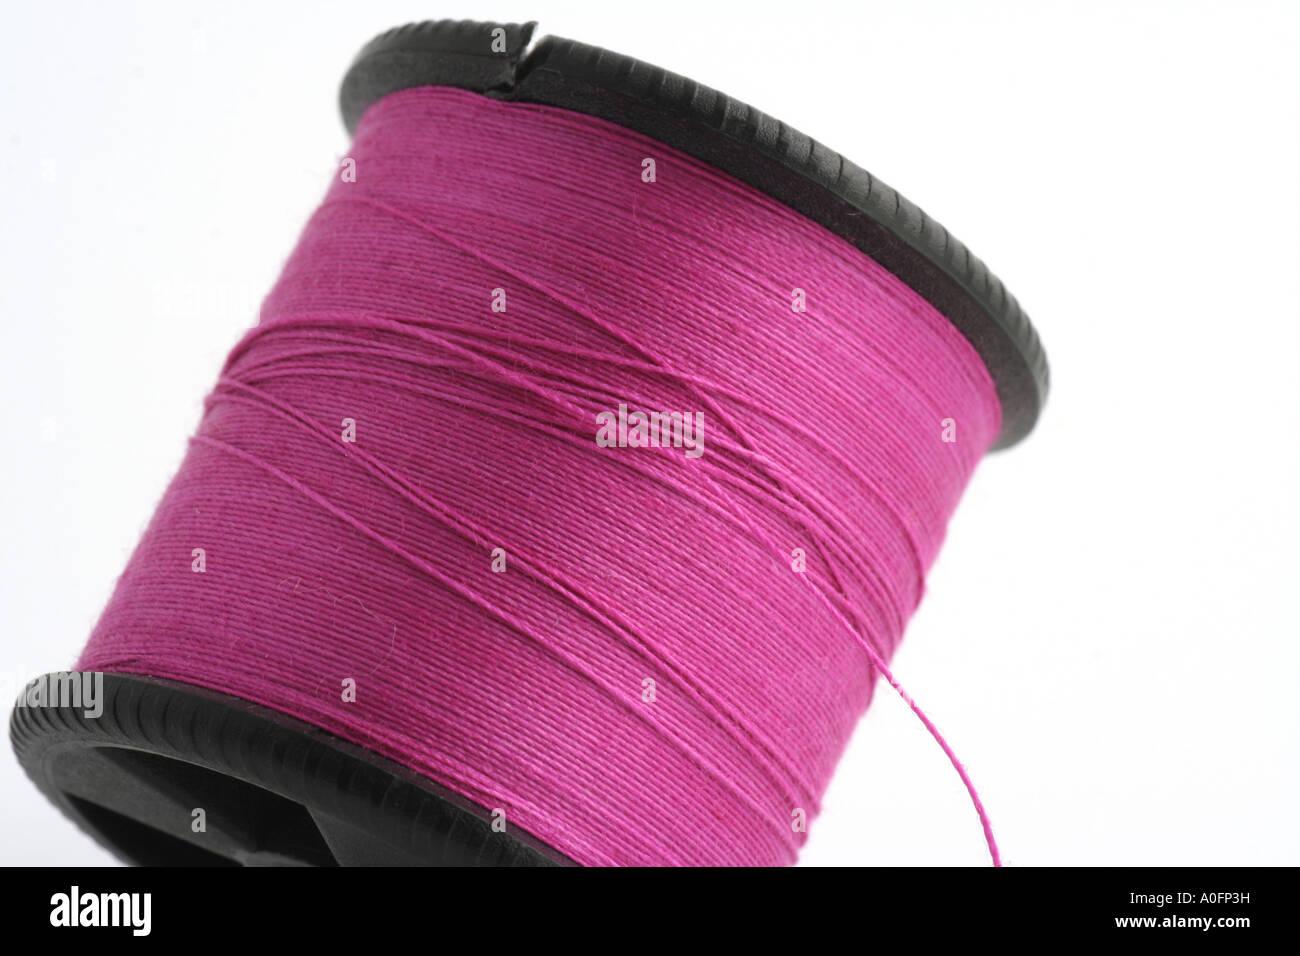 Bobbin of purple thread. - Stock Image